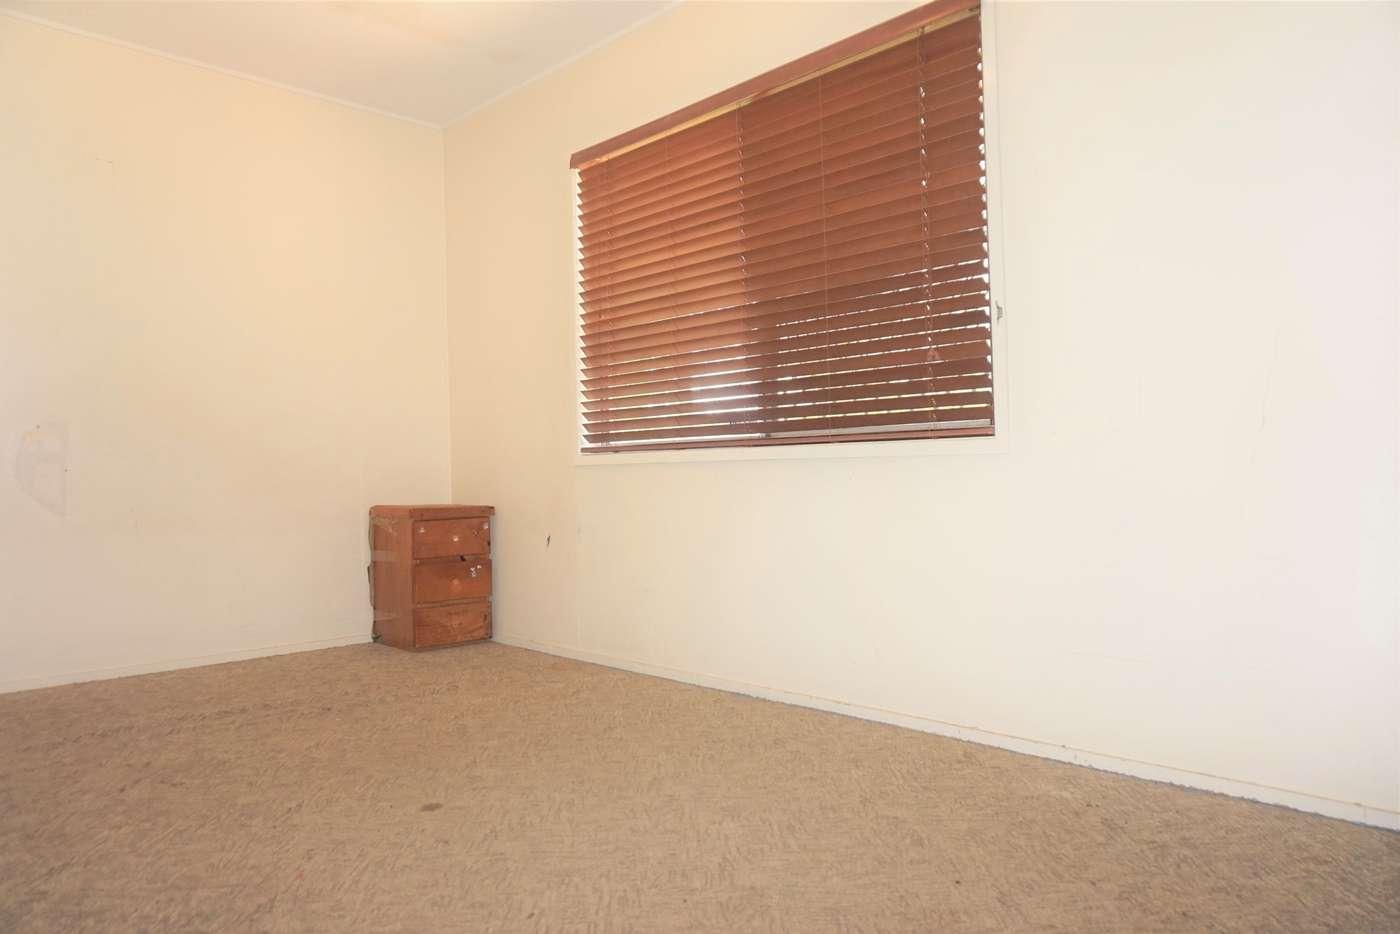 Sixth view of Homely house listing, 32 Huron Street, Woodridge QLD 4114